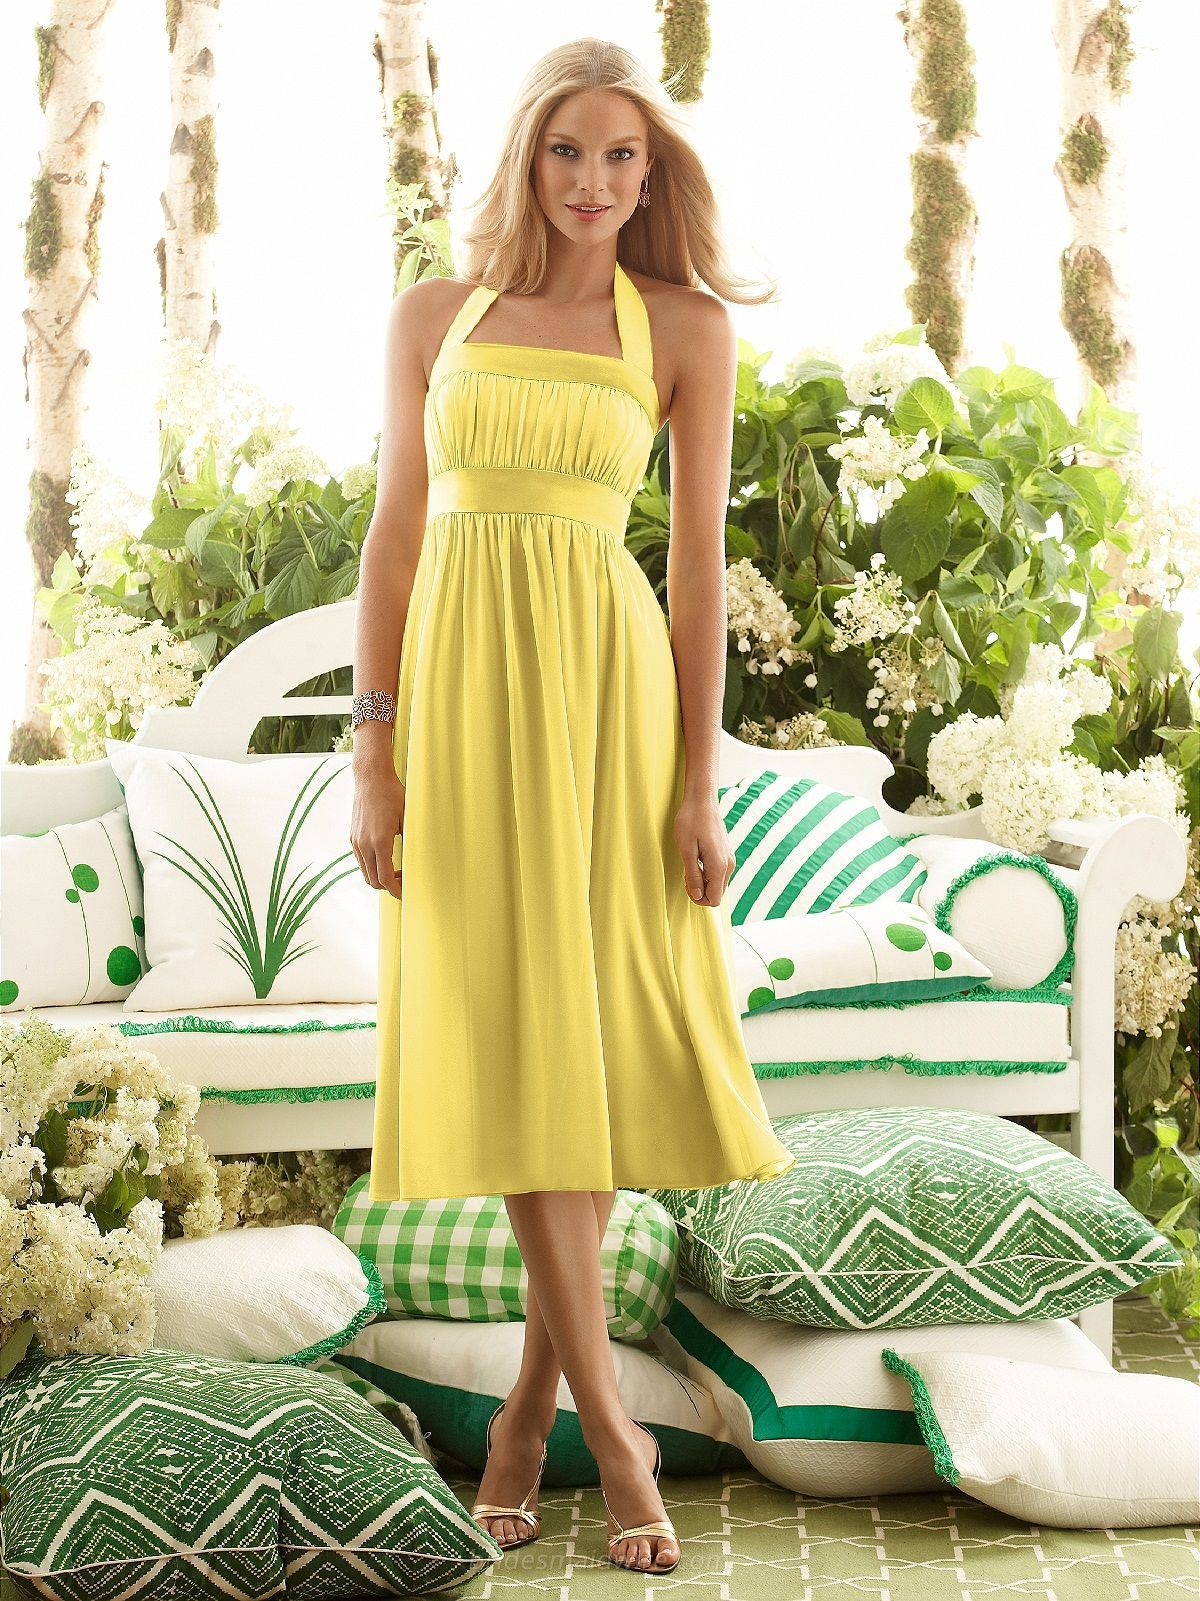 Sunflower Bridesmaid Dresses Yellow Bridesmaid Dresses Tea Length Bridesmaid Dresses Beach Bridesmaid Dresses [ 1601 x 1200 Pixel ]